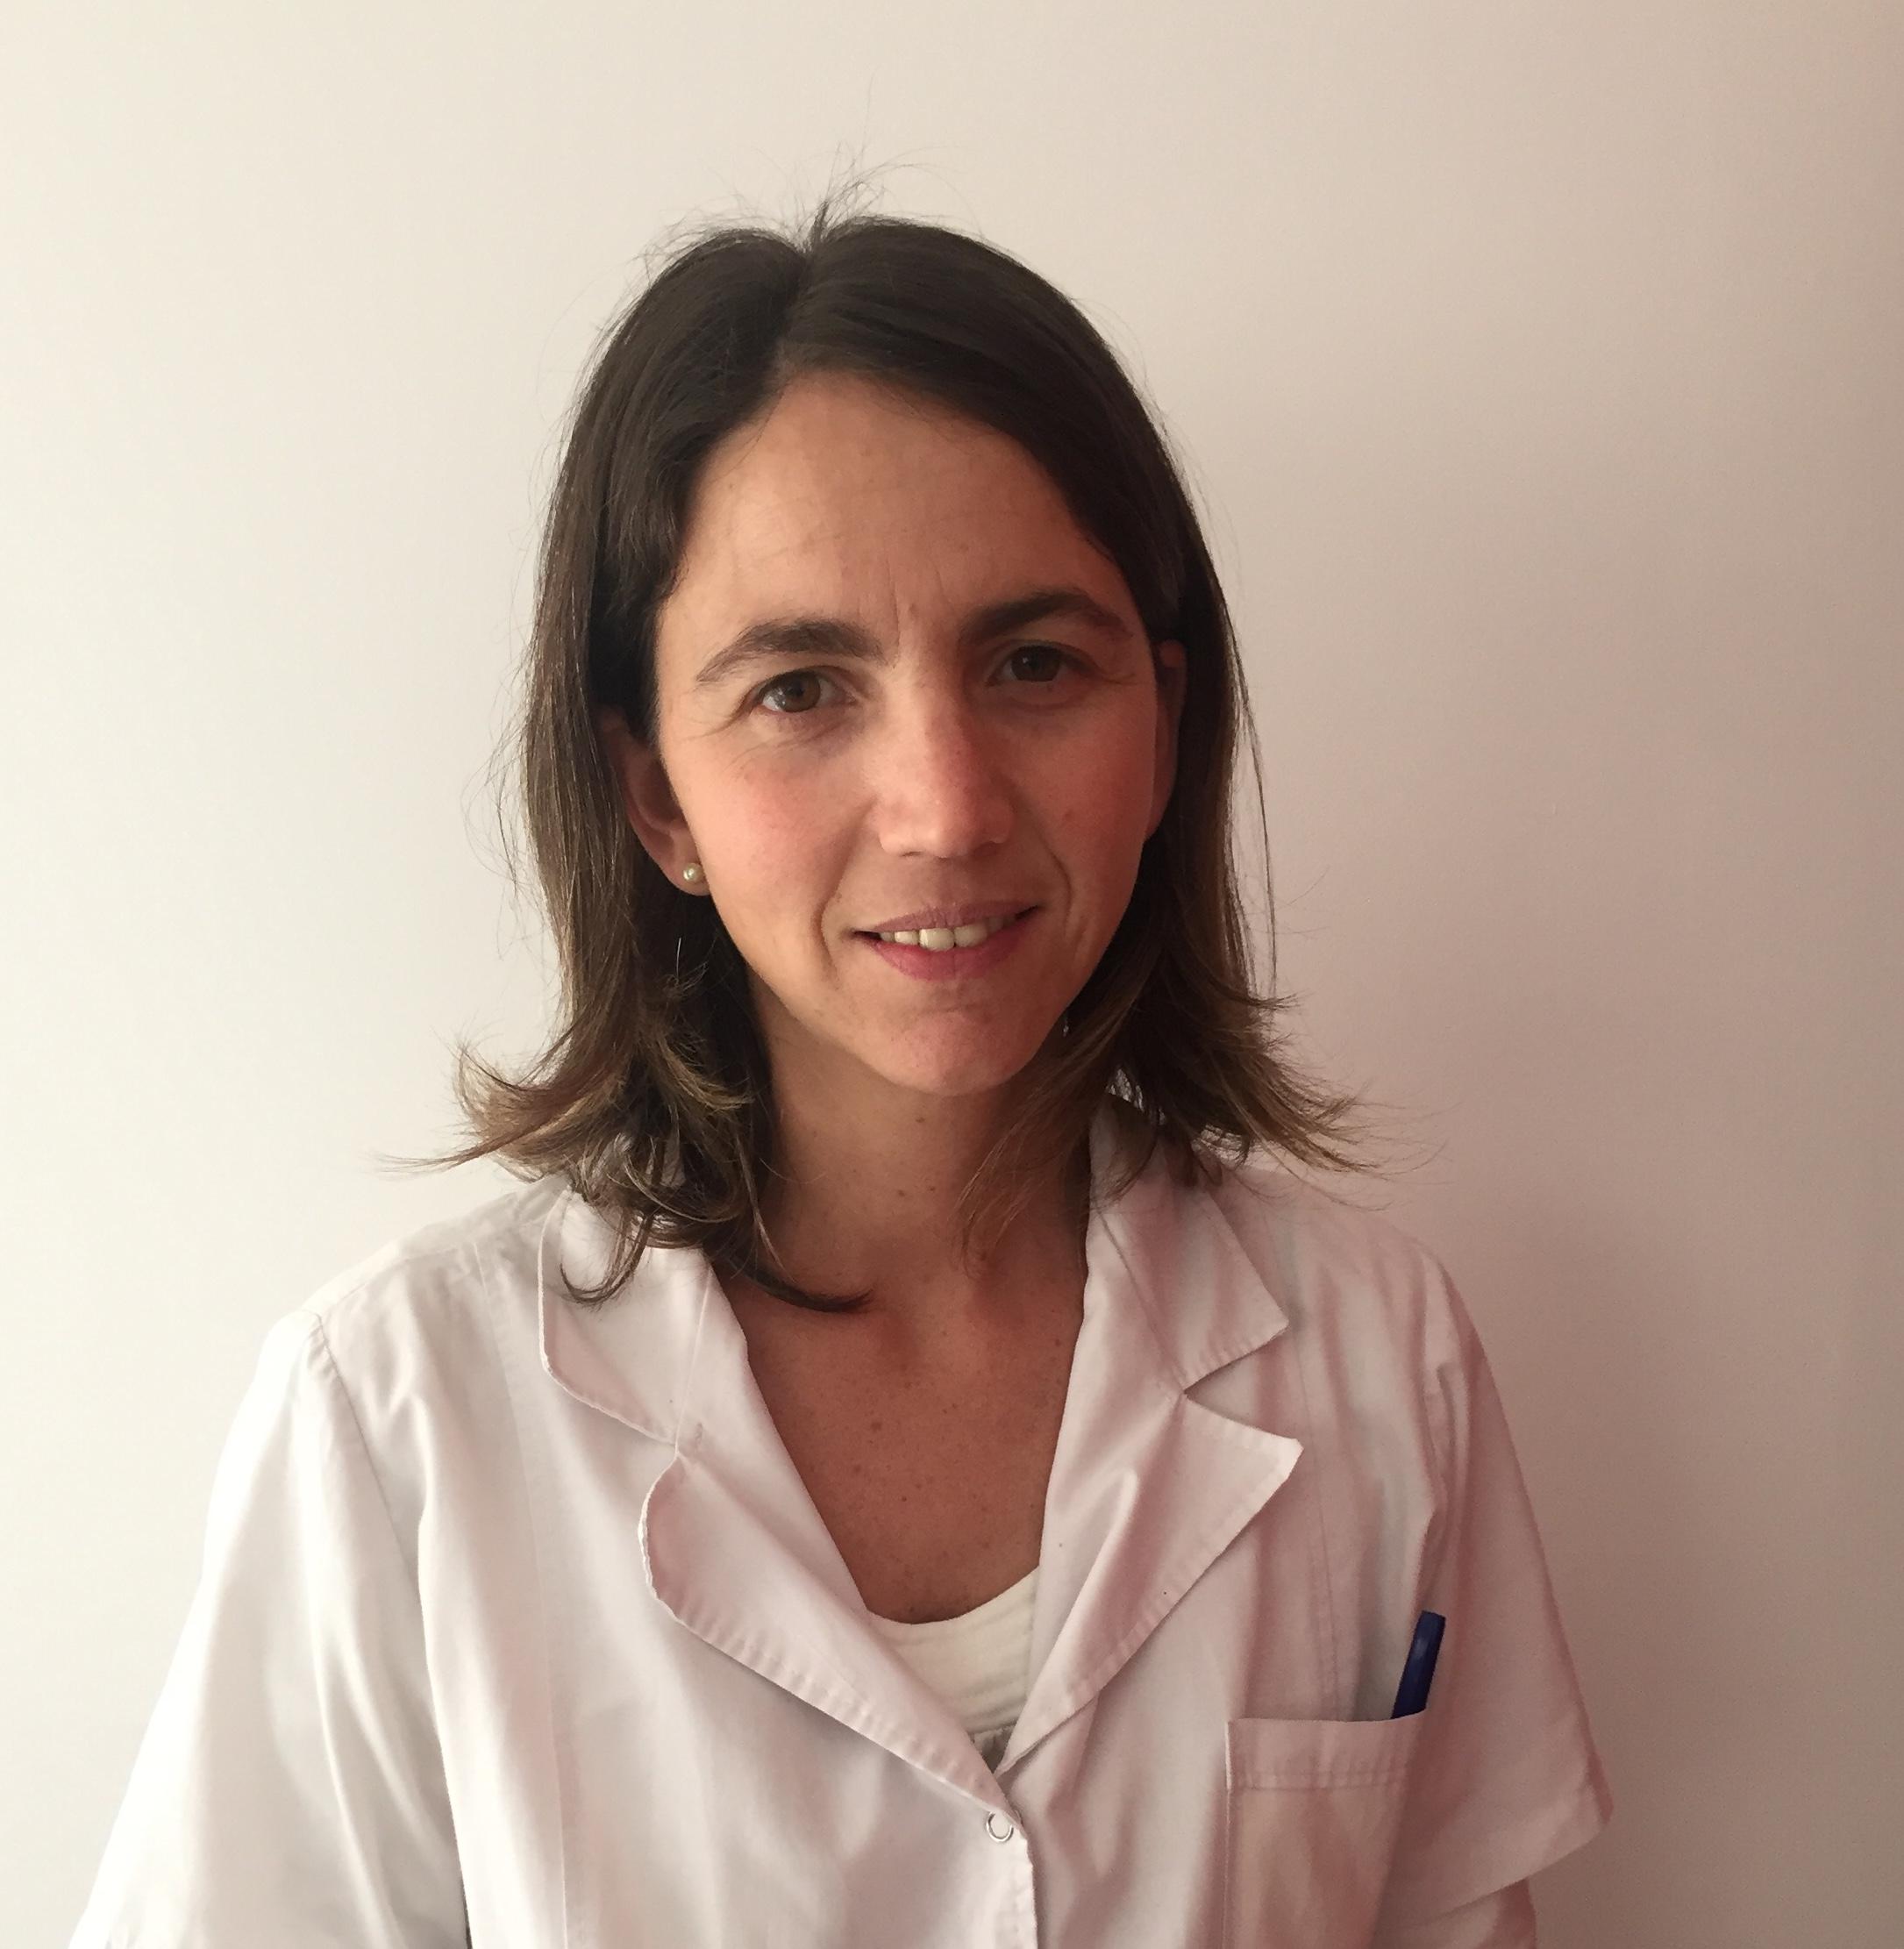 Dra. San Román Sofía